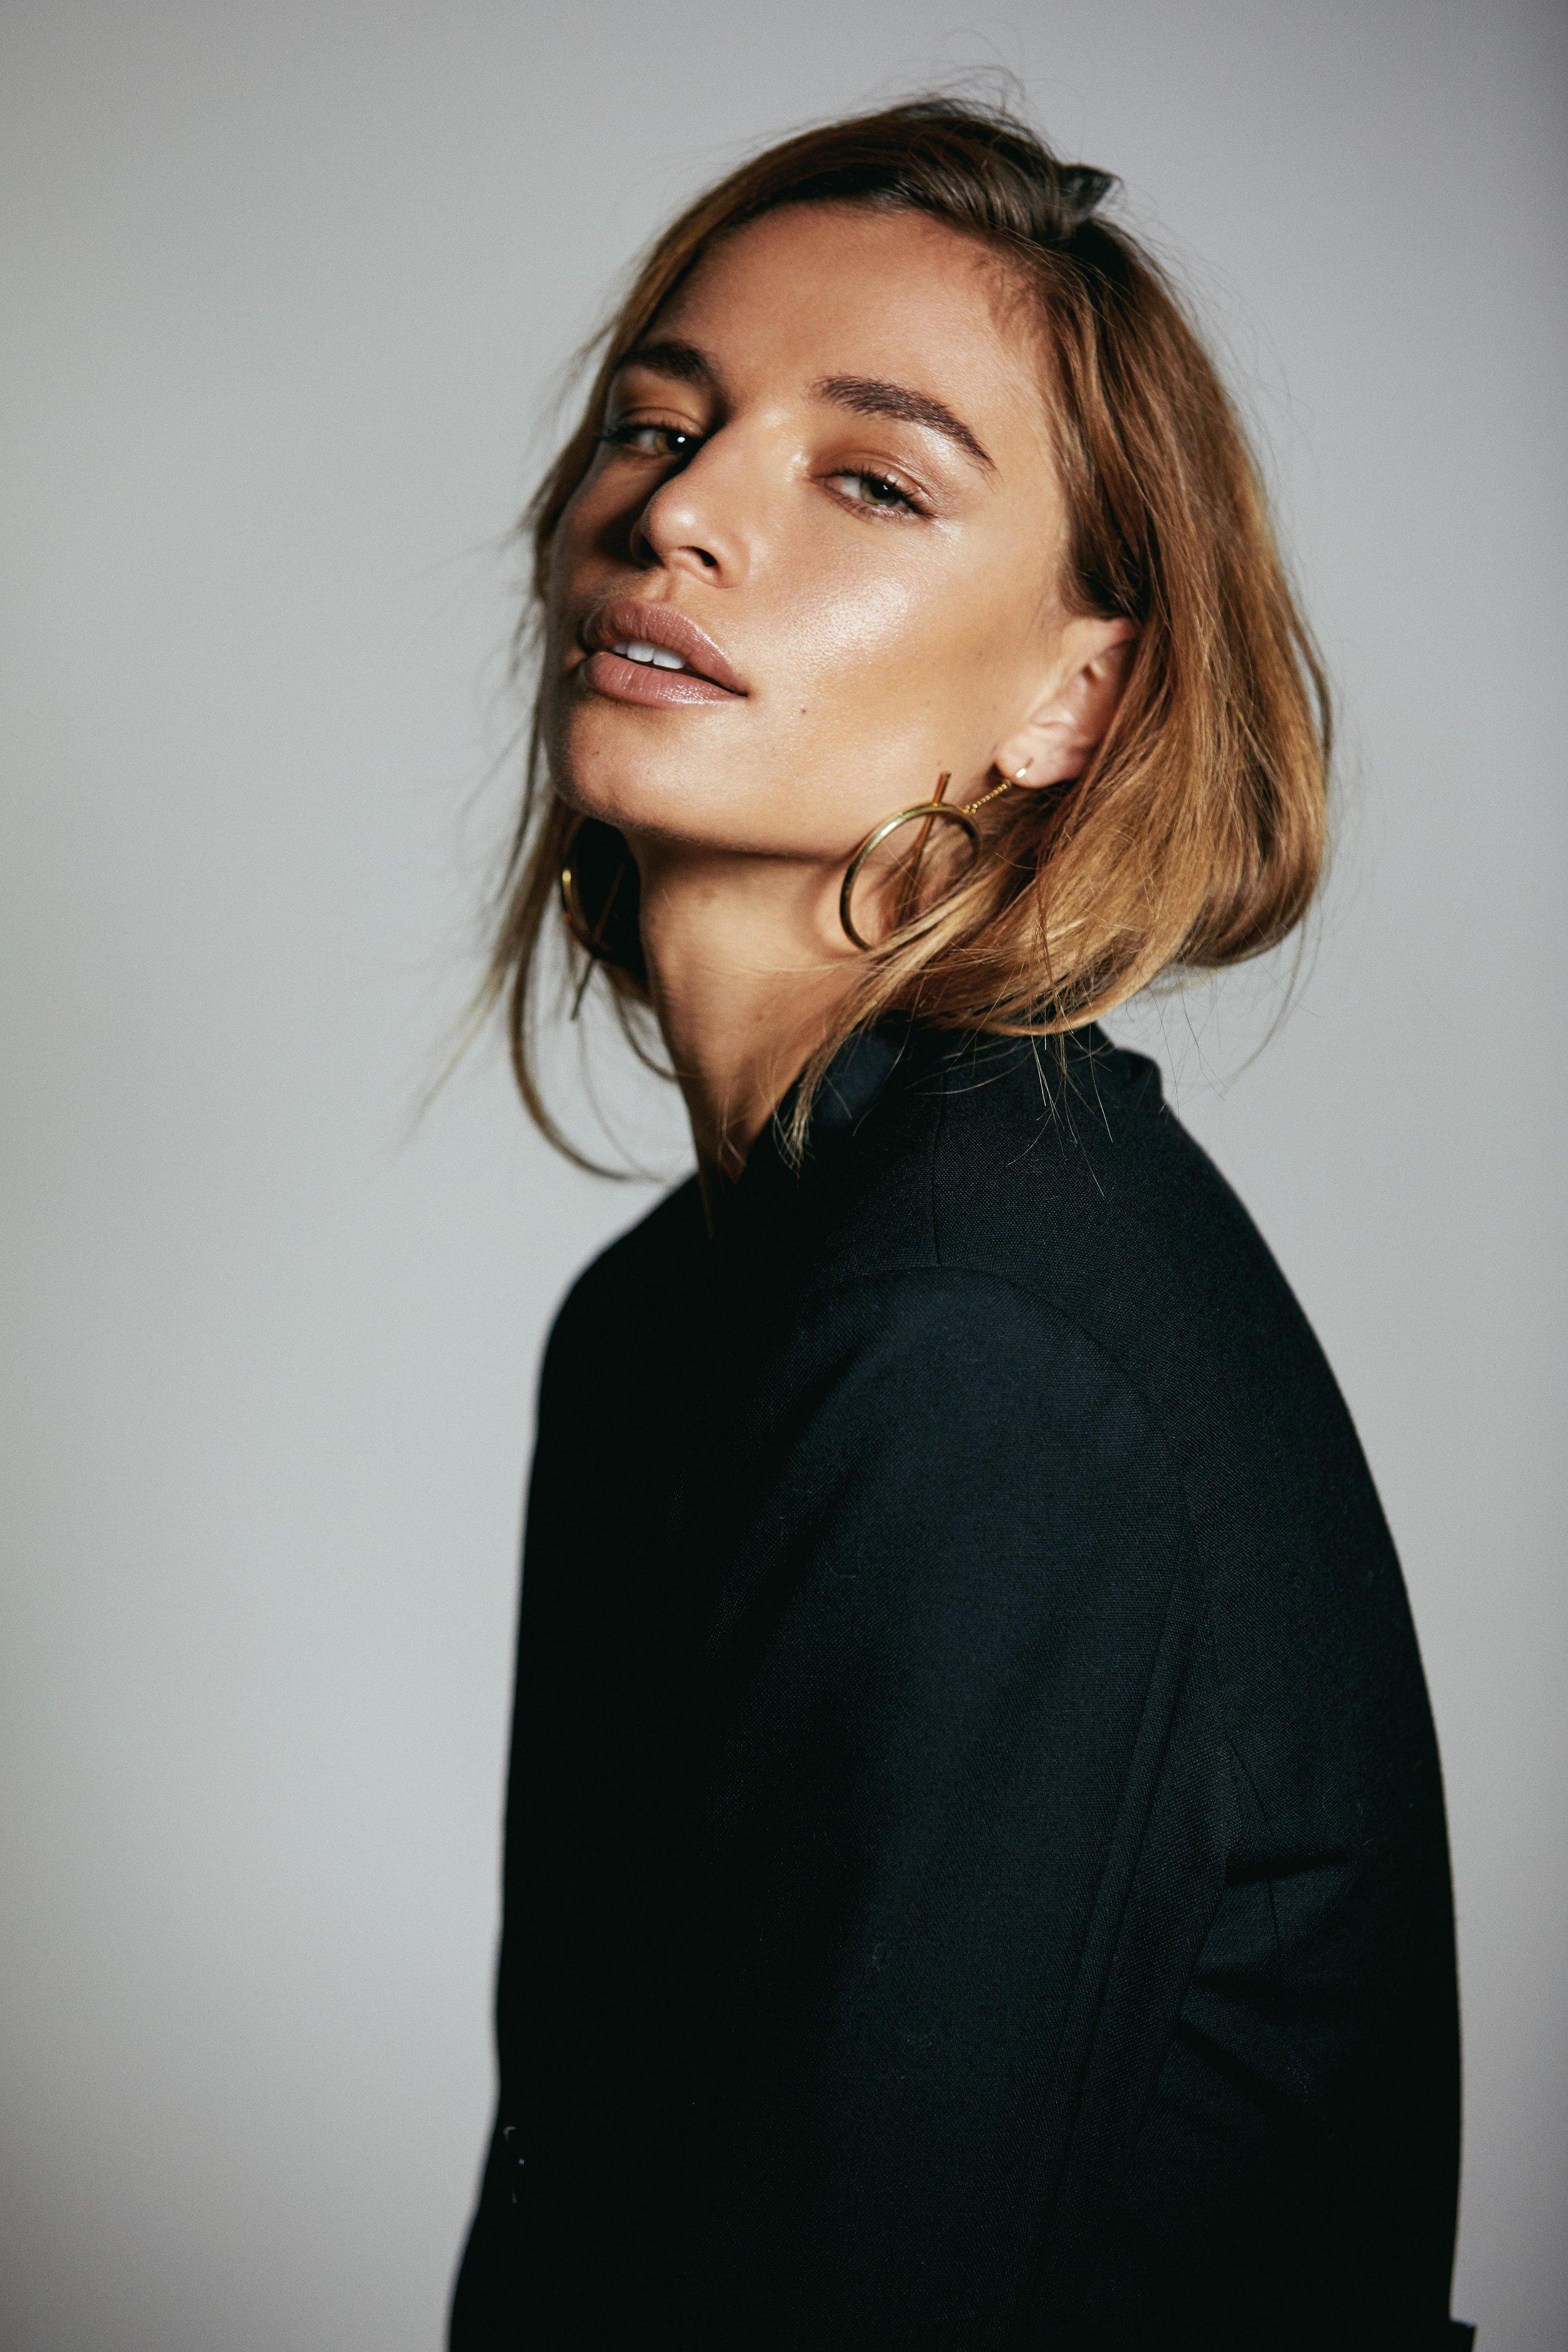 Earrings by Pina Studio